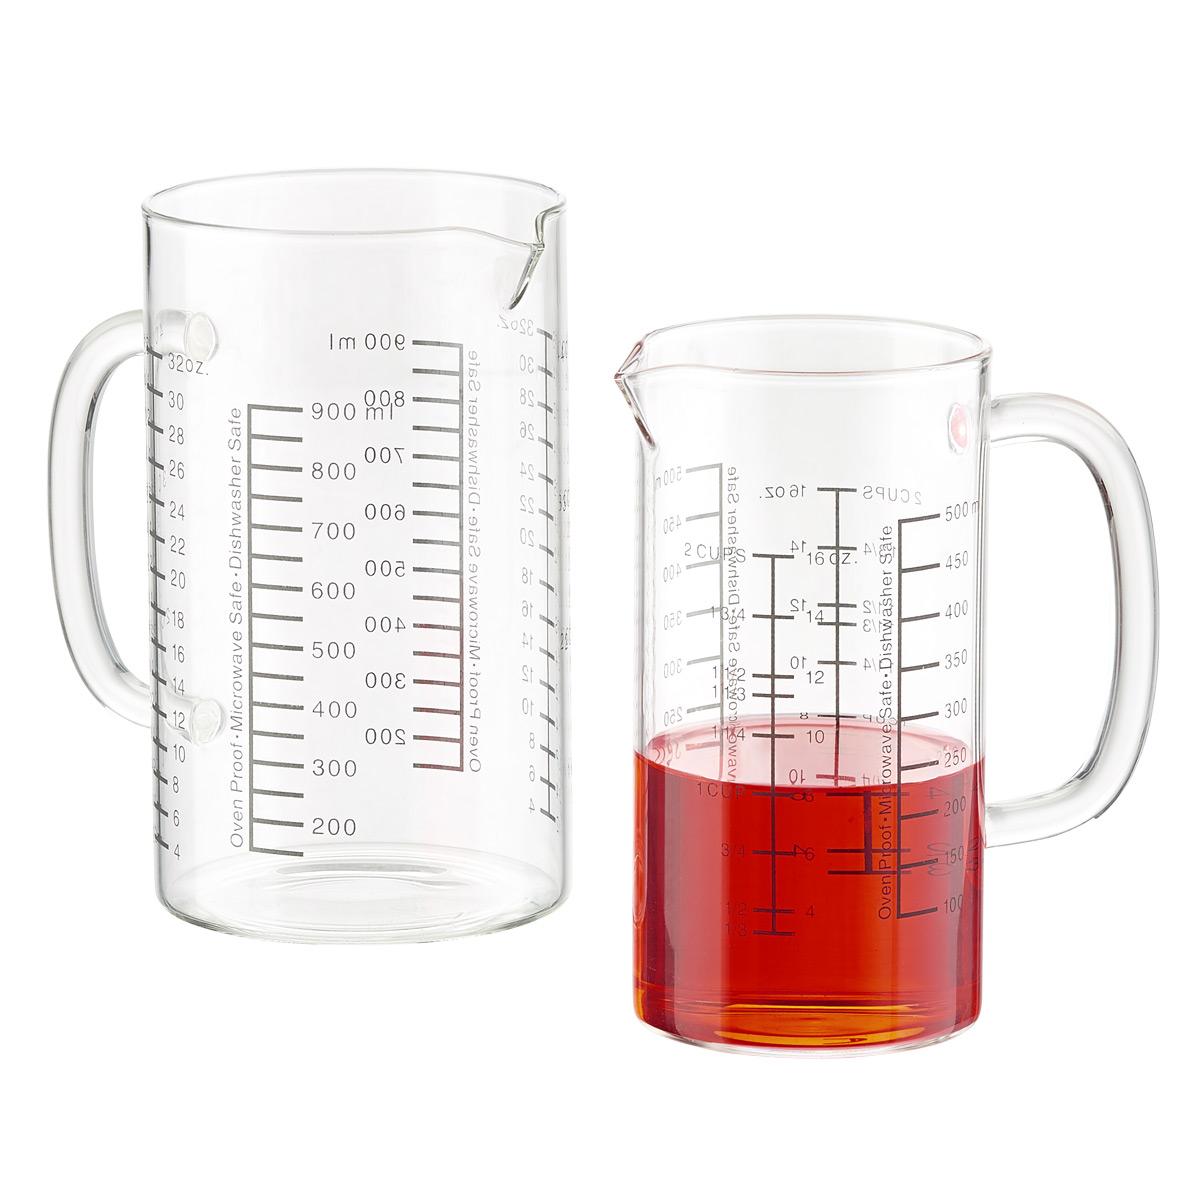 Borosilicate Measuring Cups